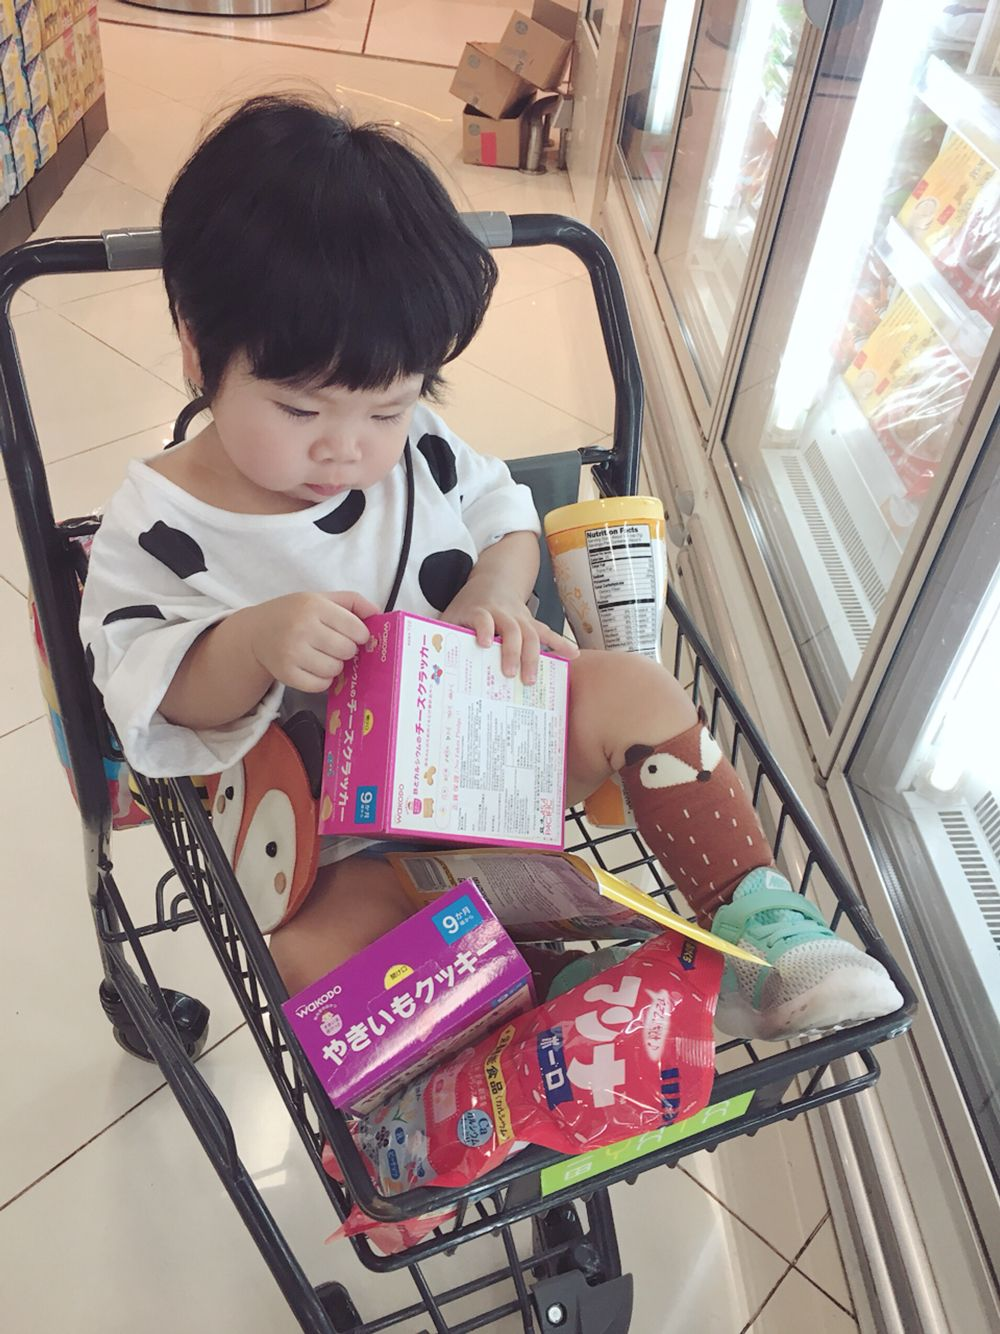 Nobody can handle dot pattern better than a toddler  Korean kids fashion www.littleredcapkids.com